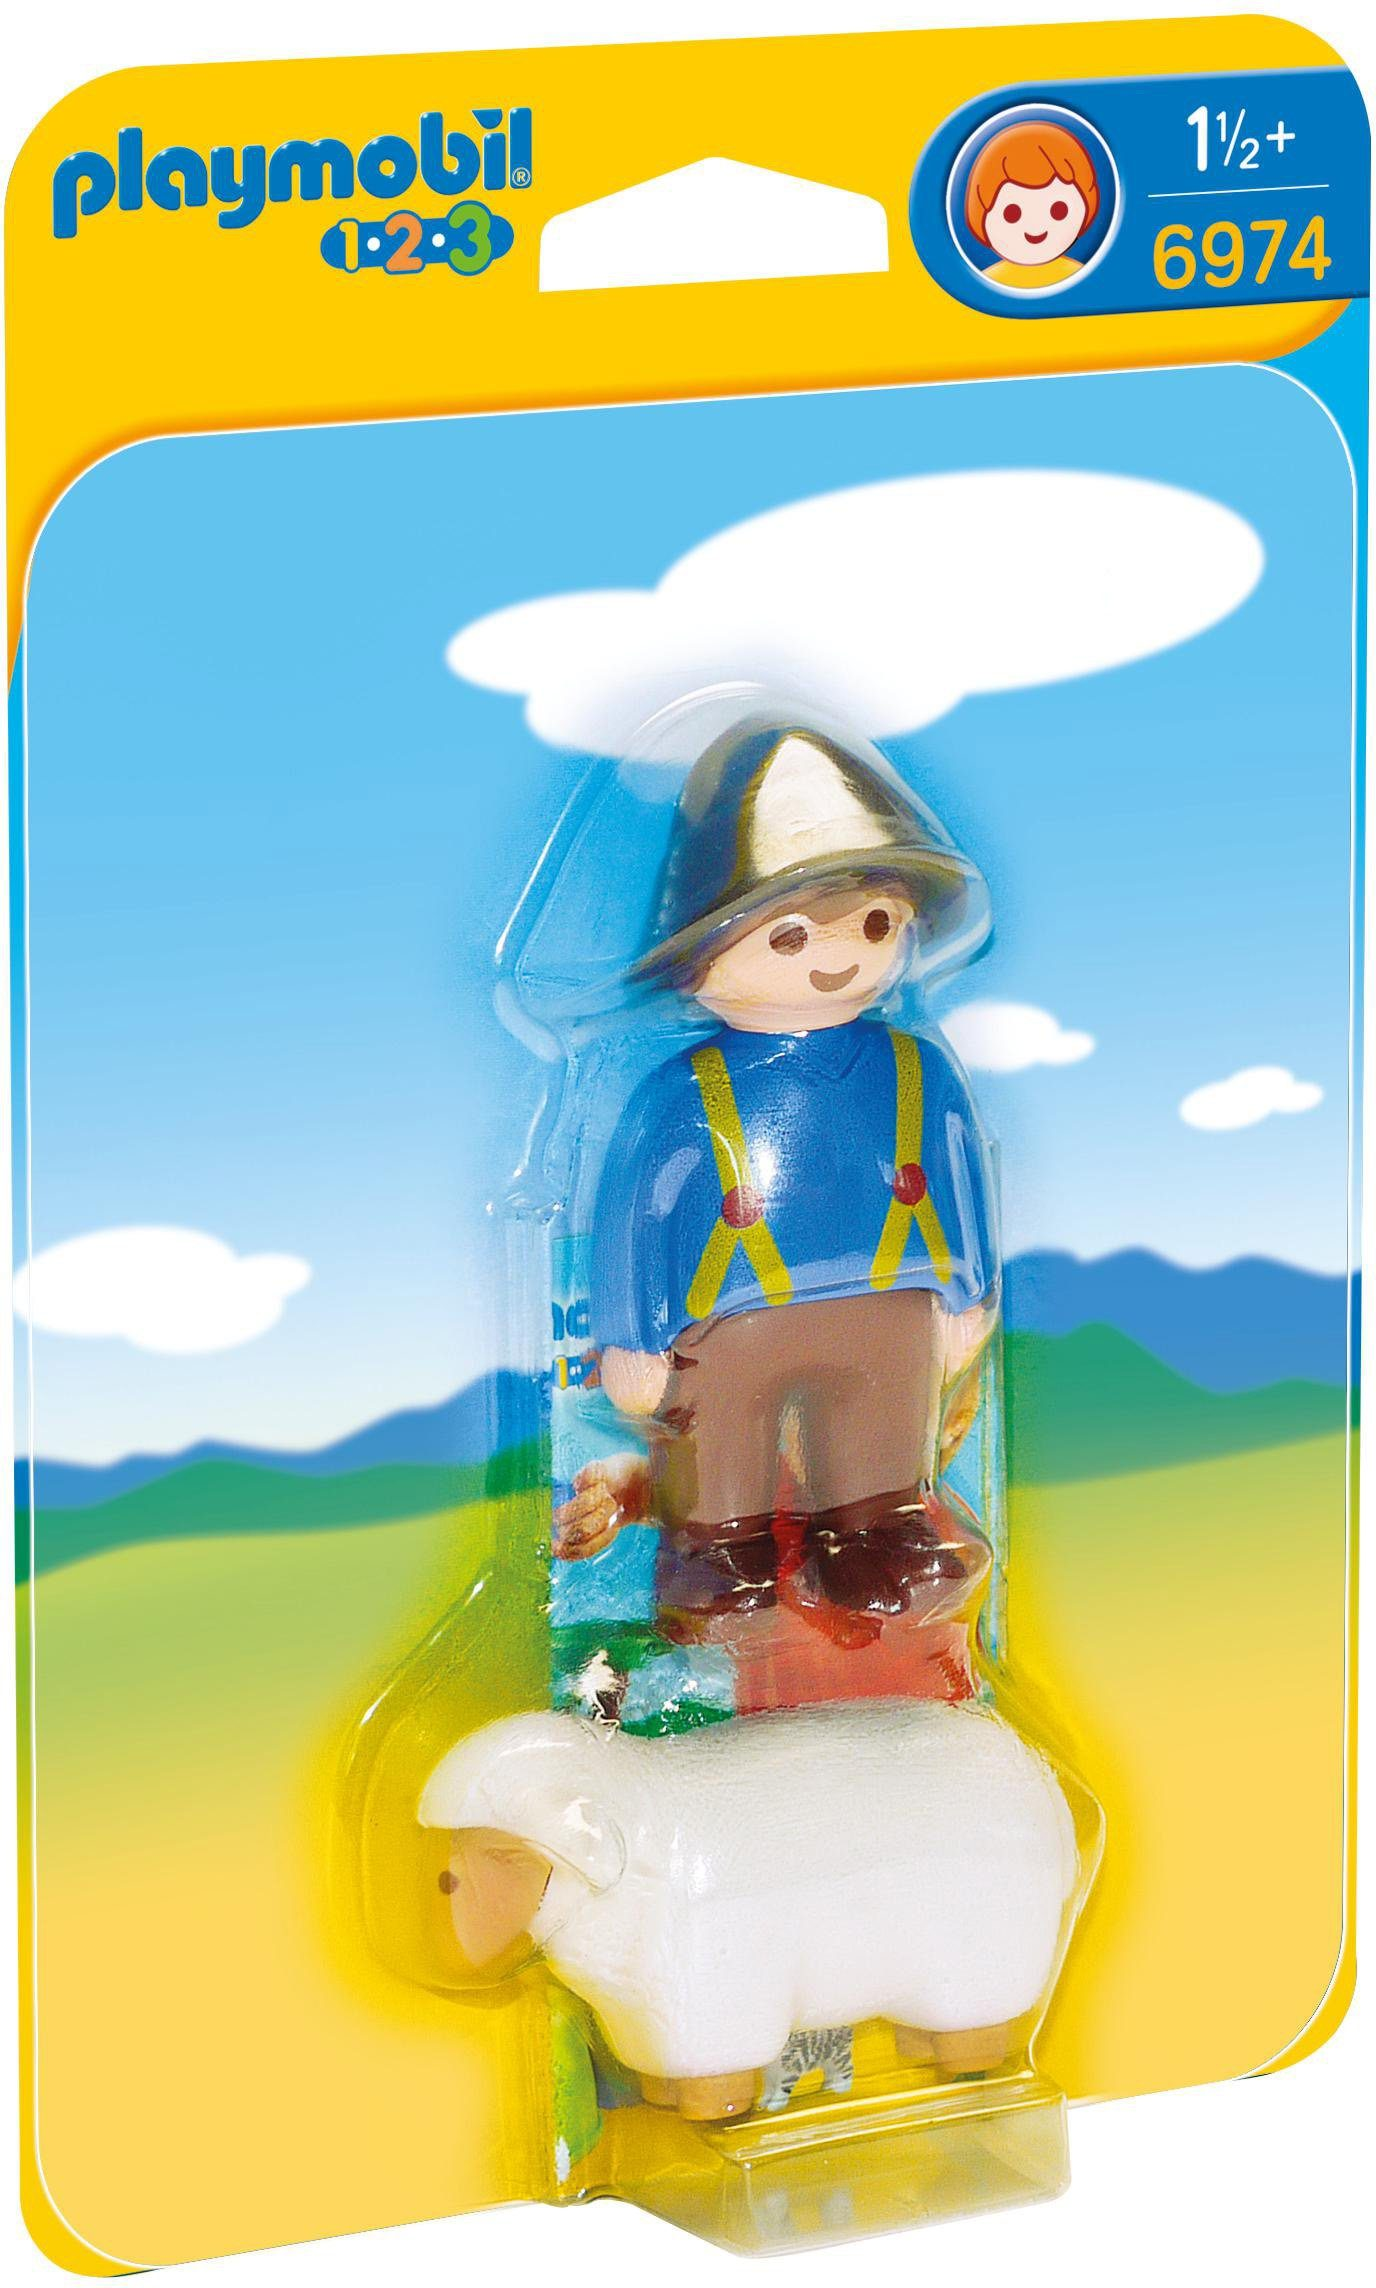 Playmobil® Schäfer mit Schaf (6974), »Playmobil 1-2-3«